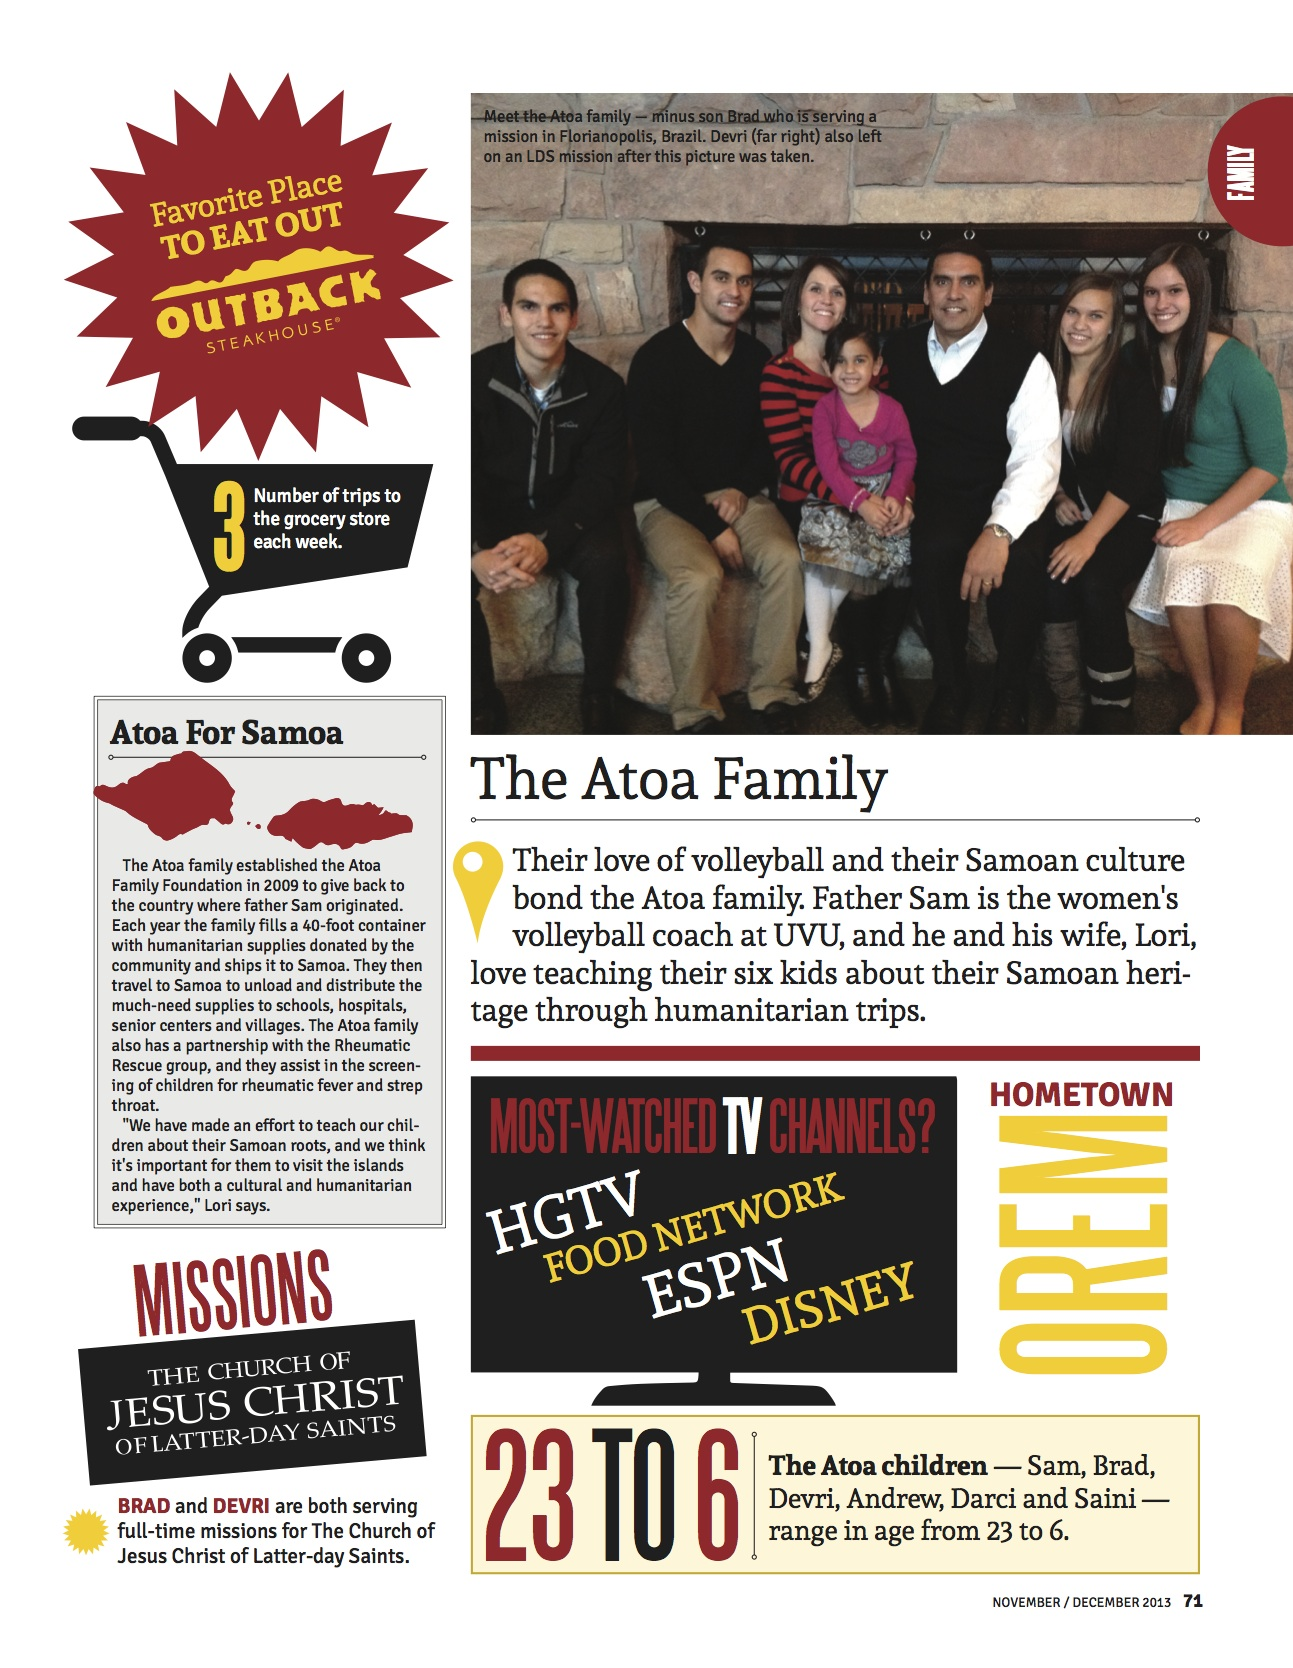 Atoa Family